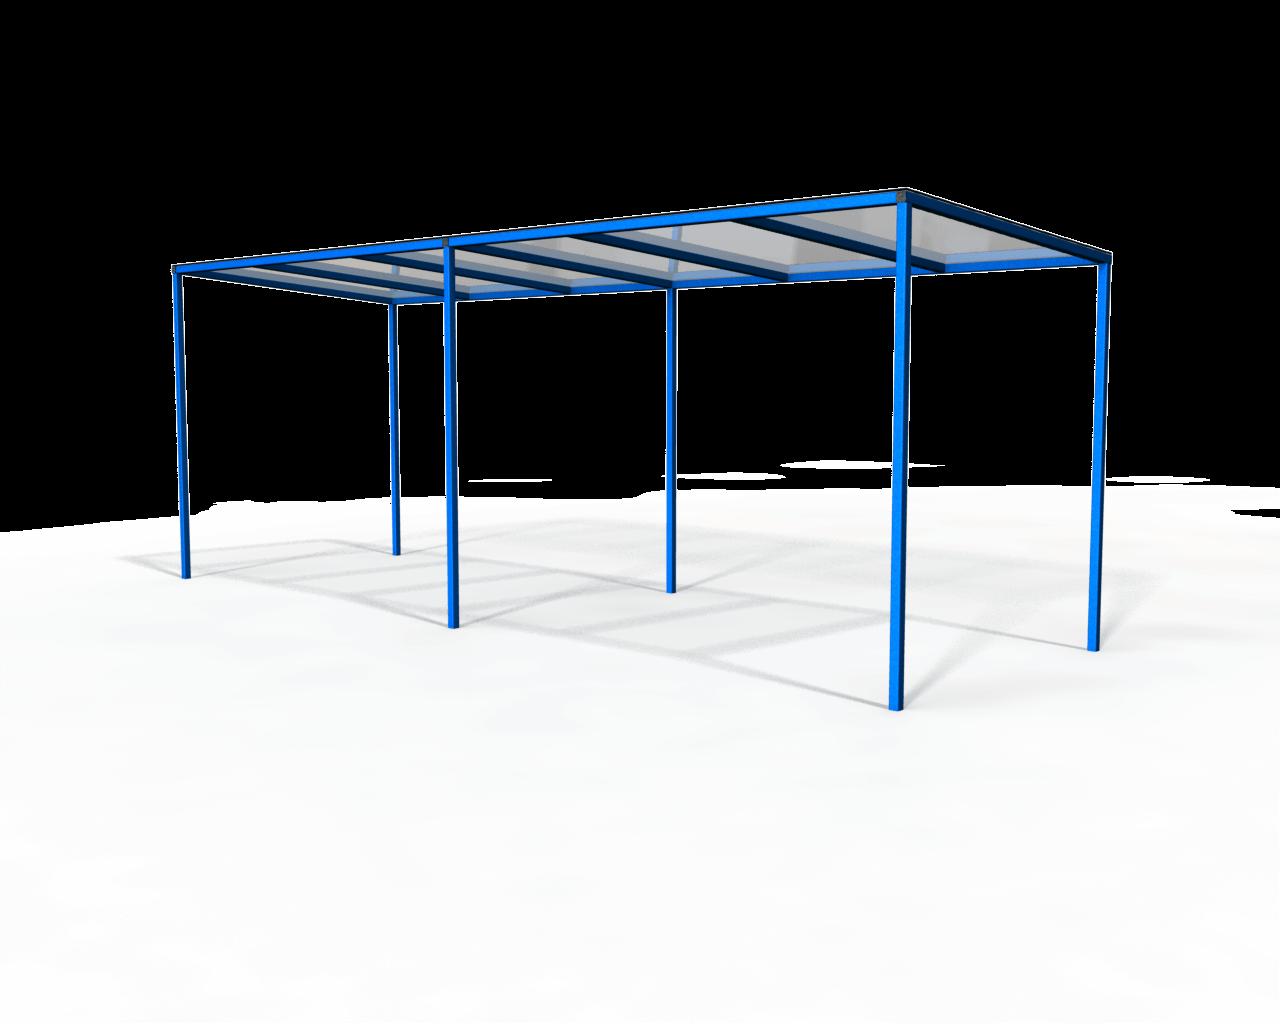 Bristol Mono Pitch Canopy/Walkway - Economy module